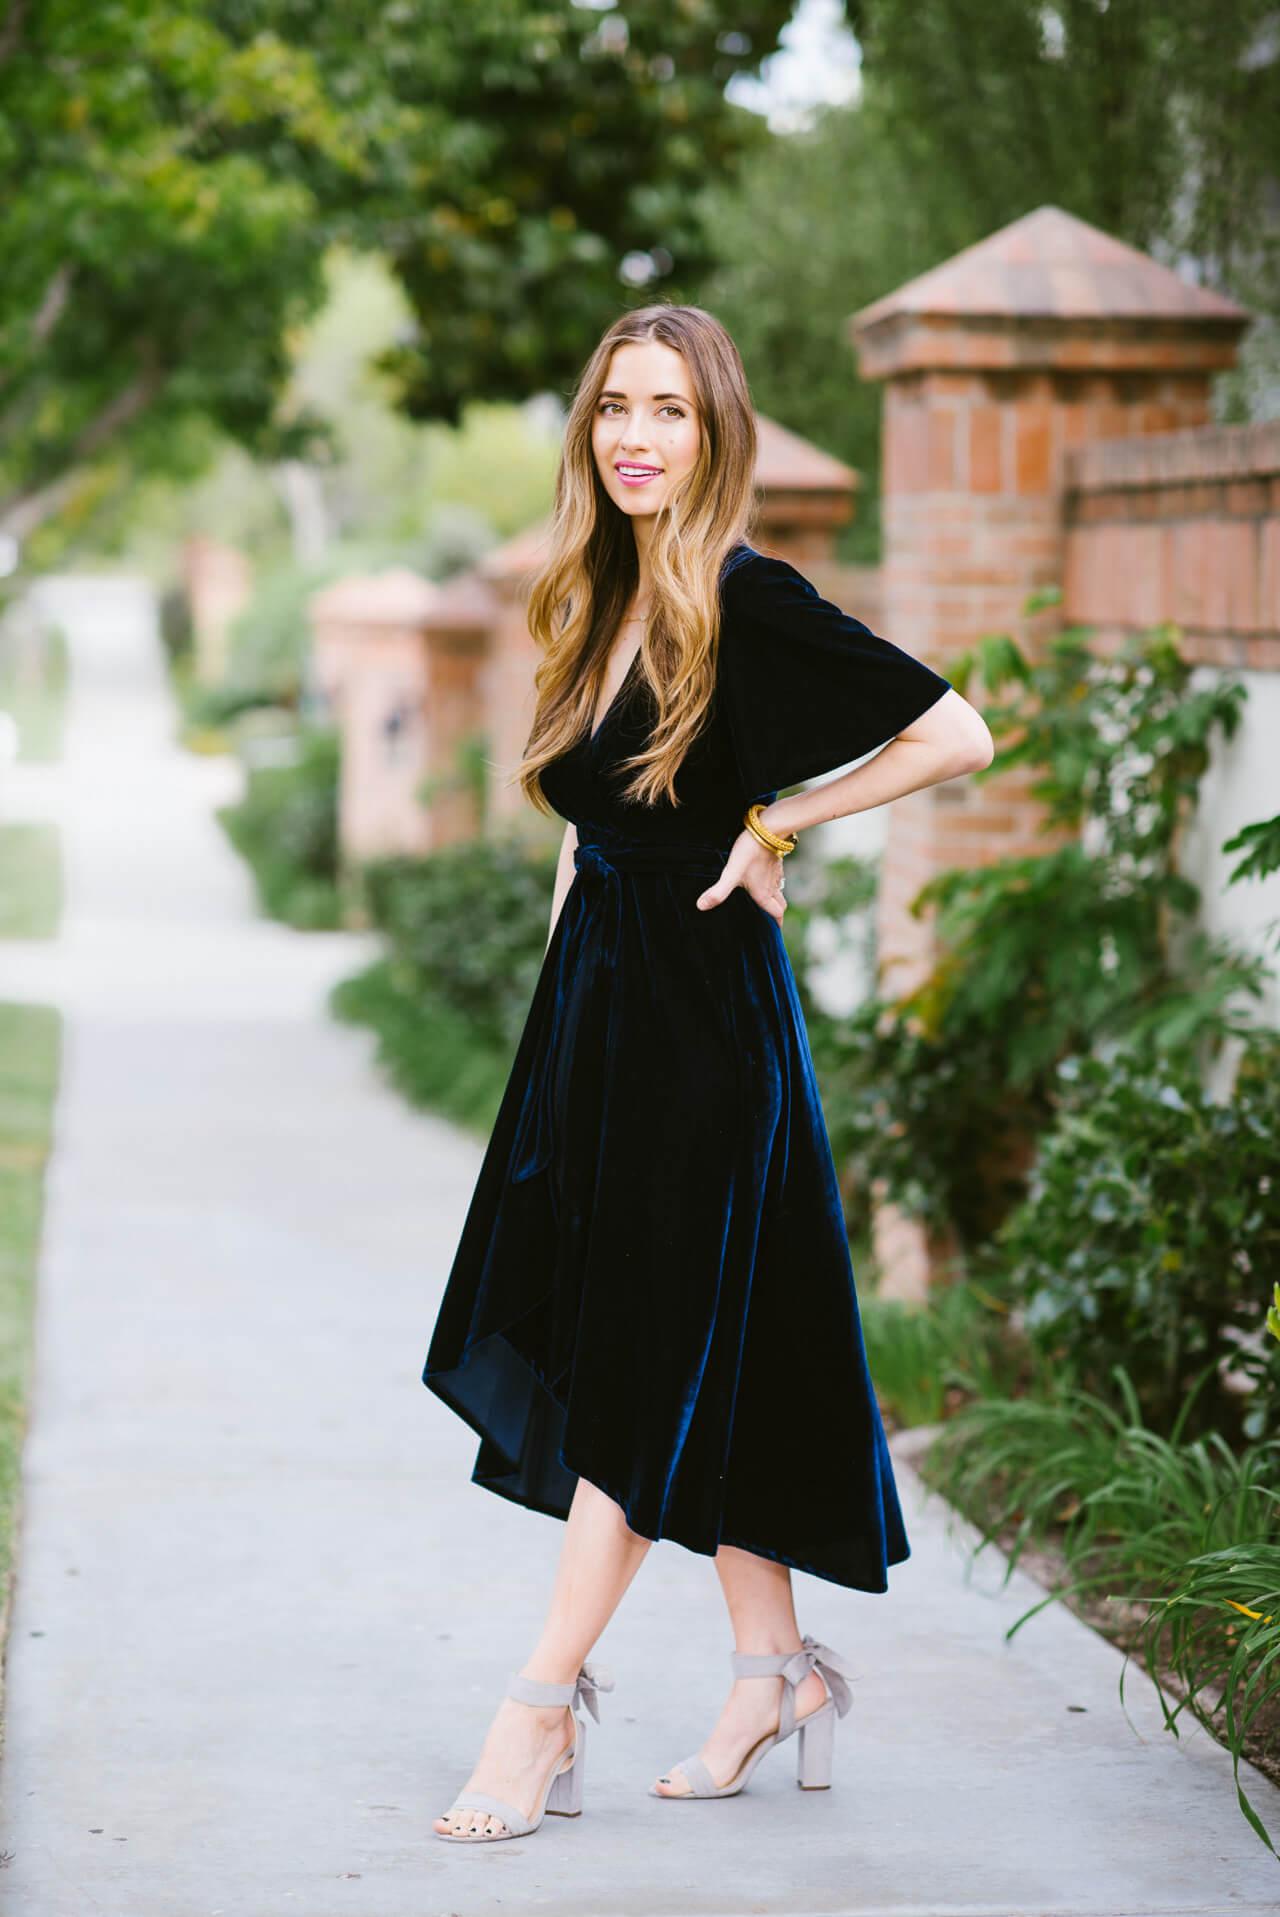 Wearing a velvet wrap dress for Fall now on the blog - M Loves M @marmar